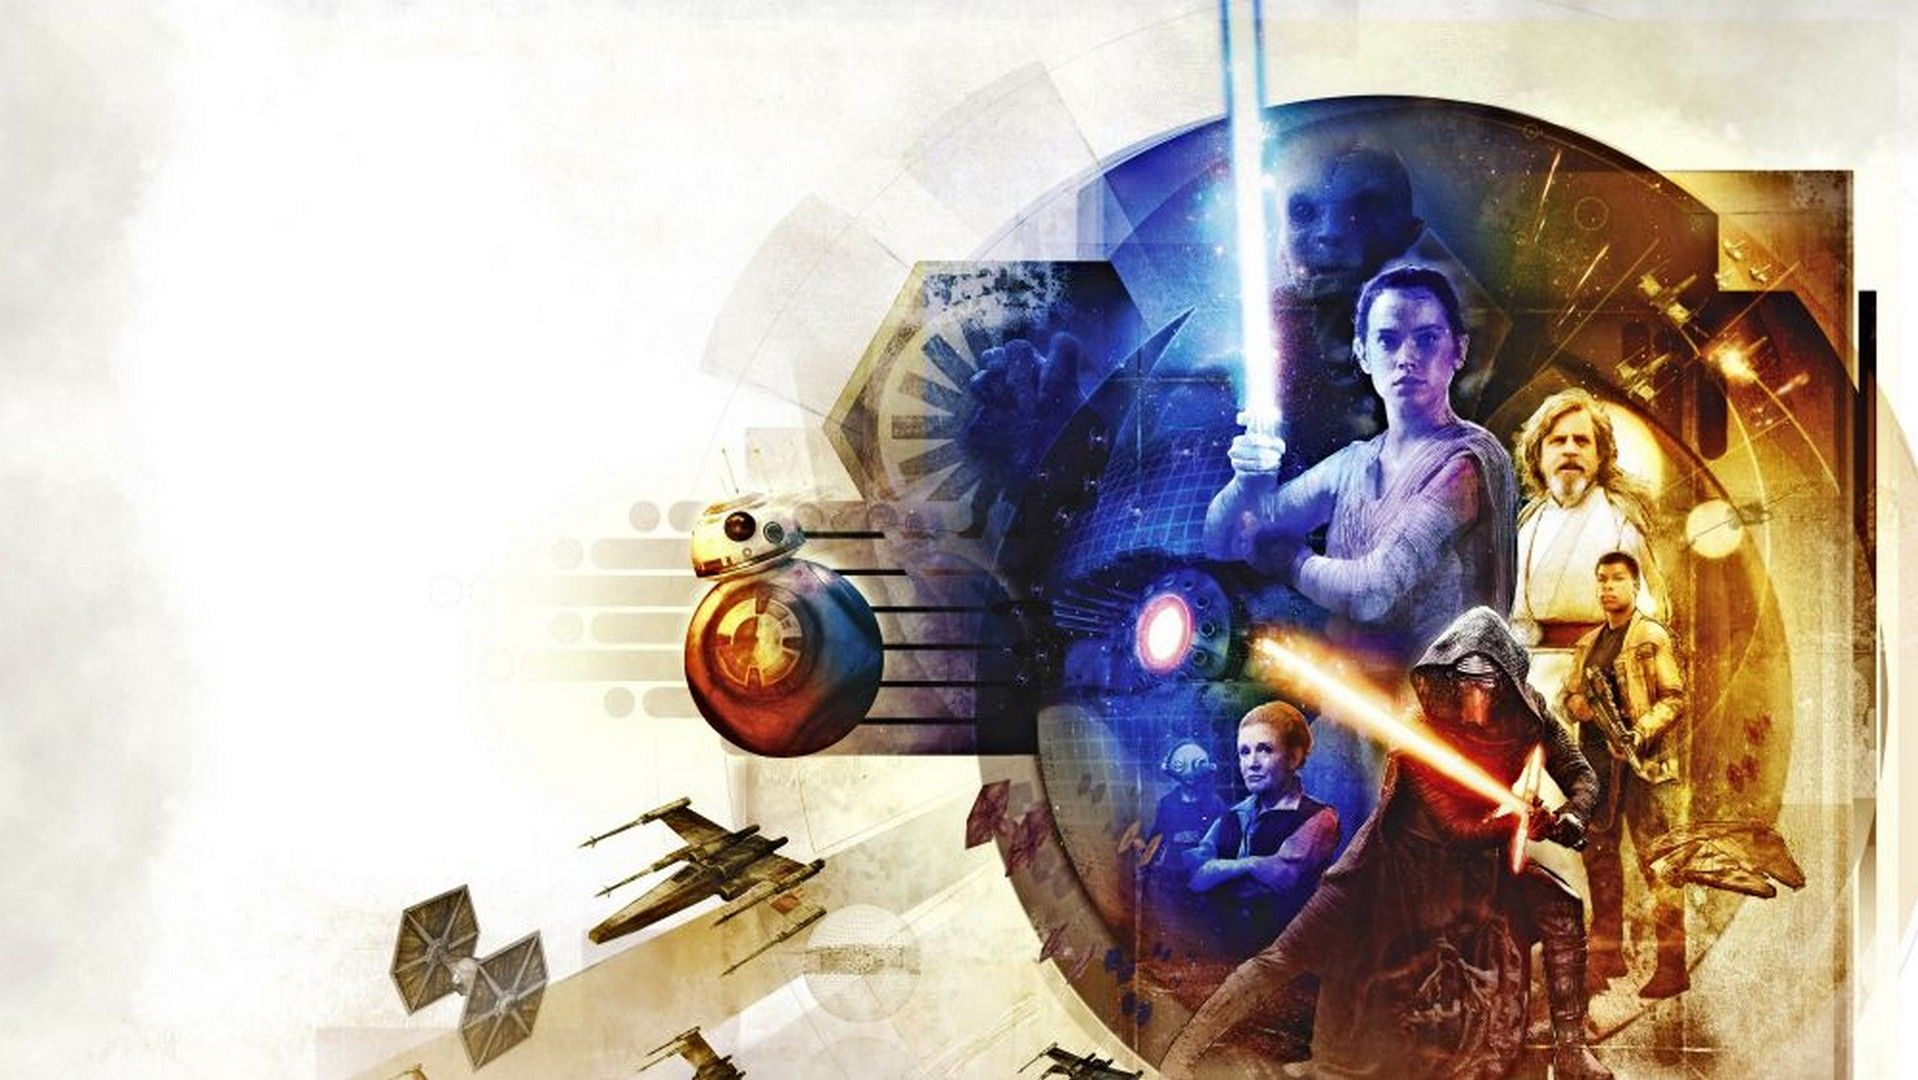 Hd Star Wars - Star Wars The Last Jedi Art , HD Wallpaper & Backgrounds